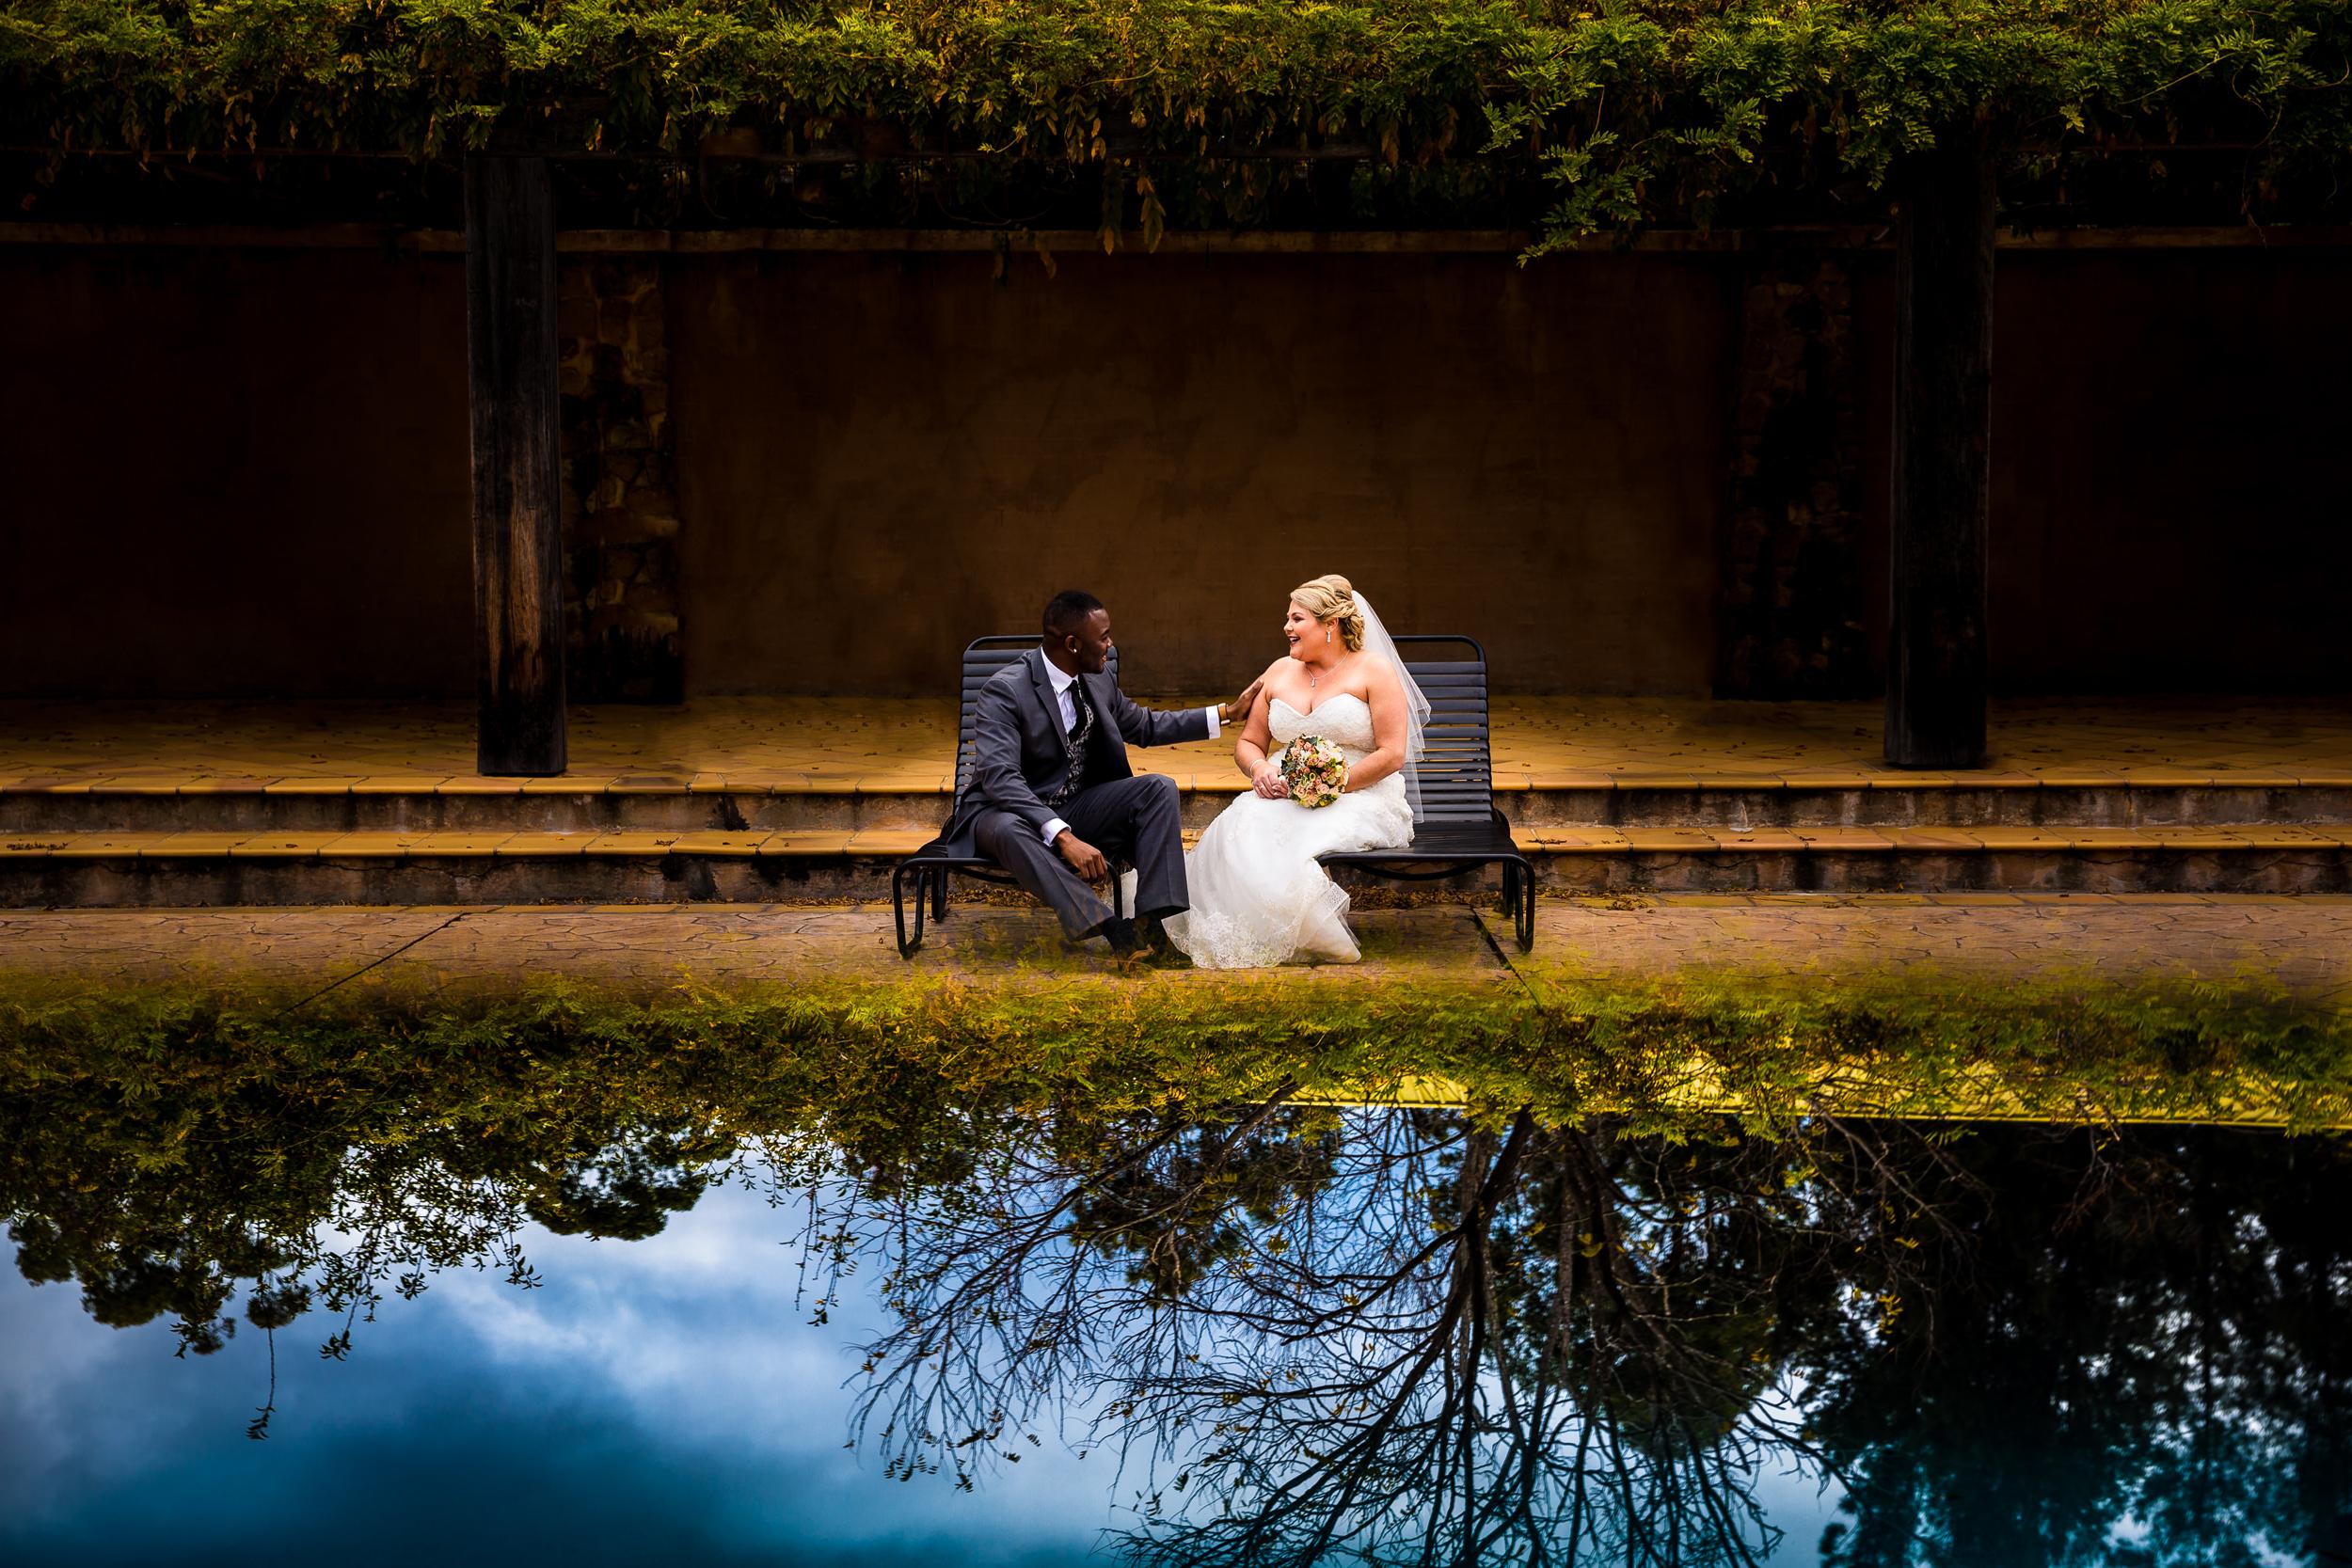 Woolley-Photography-Kaye & Alpha Wedding-3.jpg